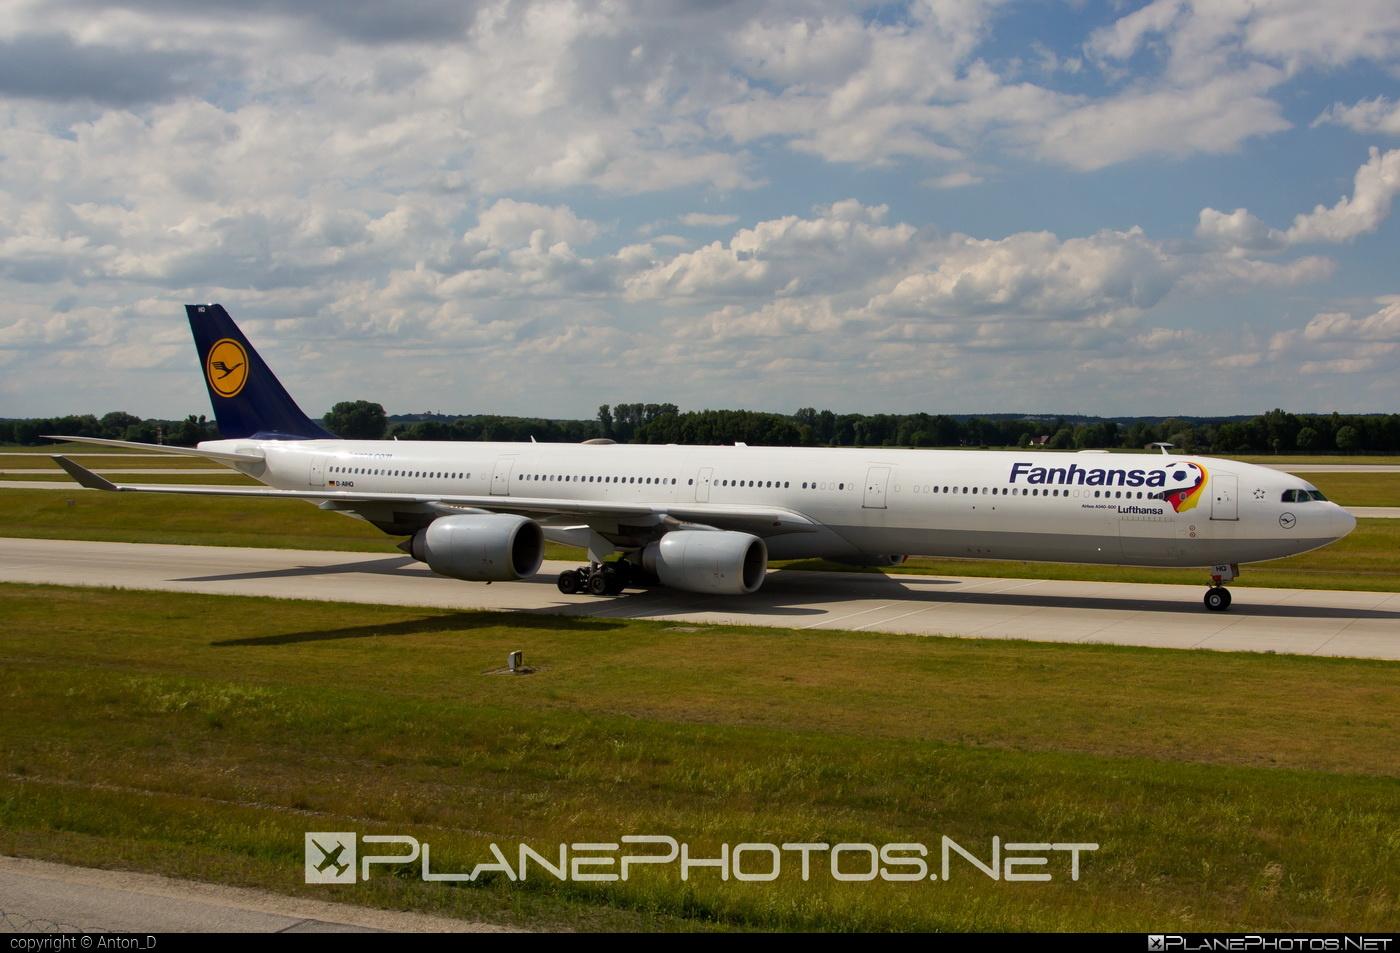 Airbus A340-642 - D-AIHQ operated by Lufthansa #a340 #a340family #airbus #airbus340 #lufthansa